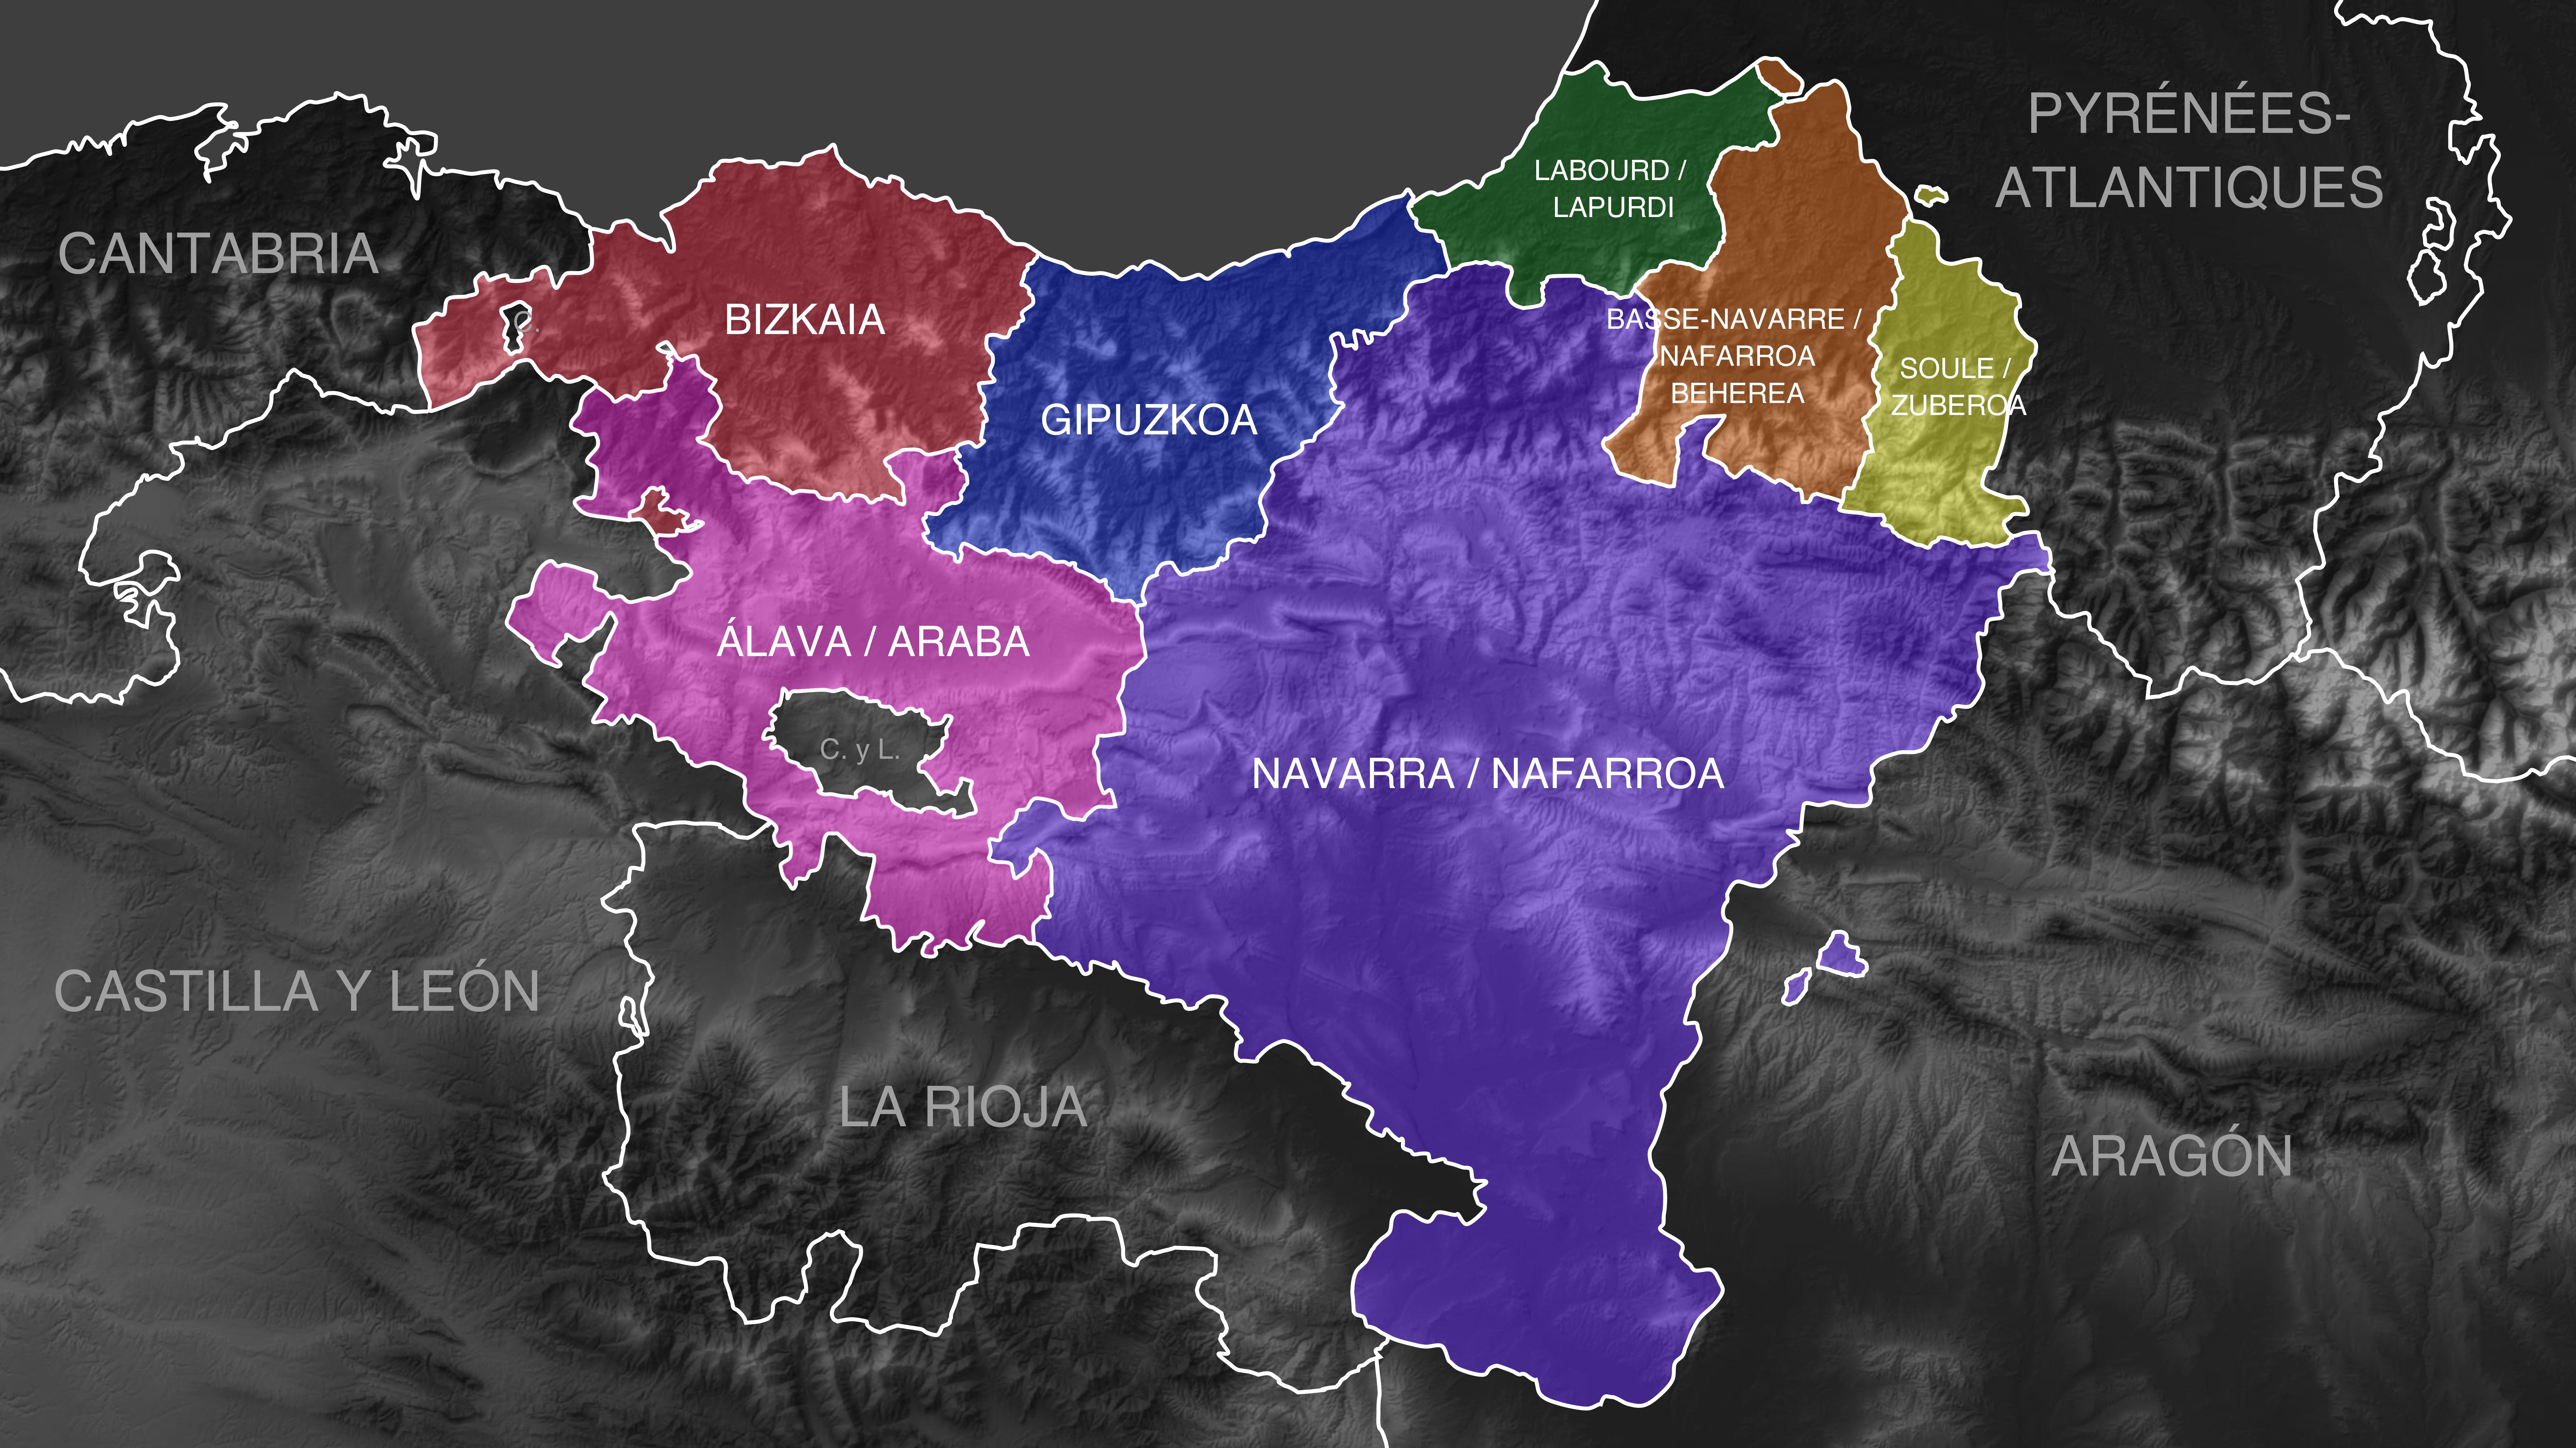 Euskal Herriko Mapa Politikoa.Fitxategi Euskal Herria Politico Politikoa Png